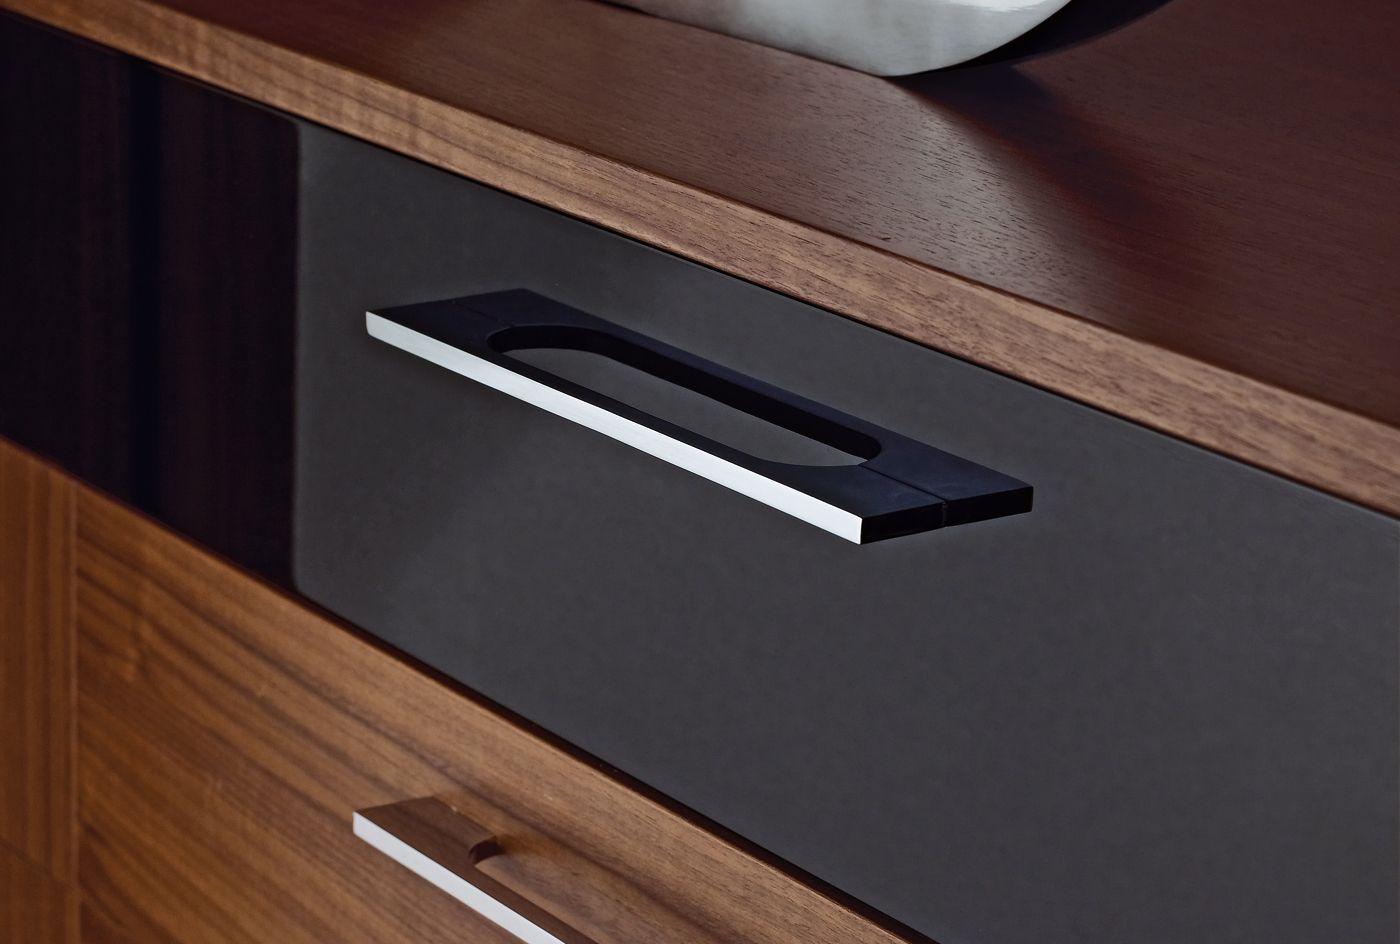 Chrome Handles Complete The Modena Black Bedroom Furniture Range Http Www Sharps